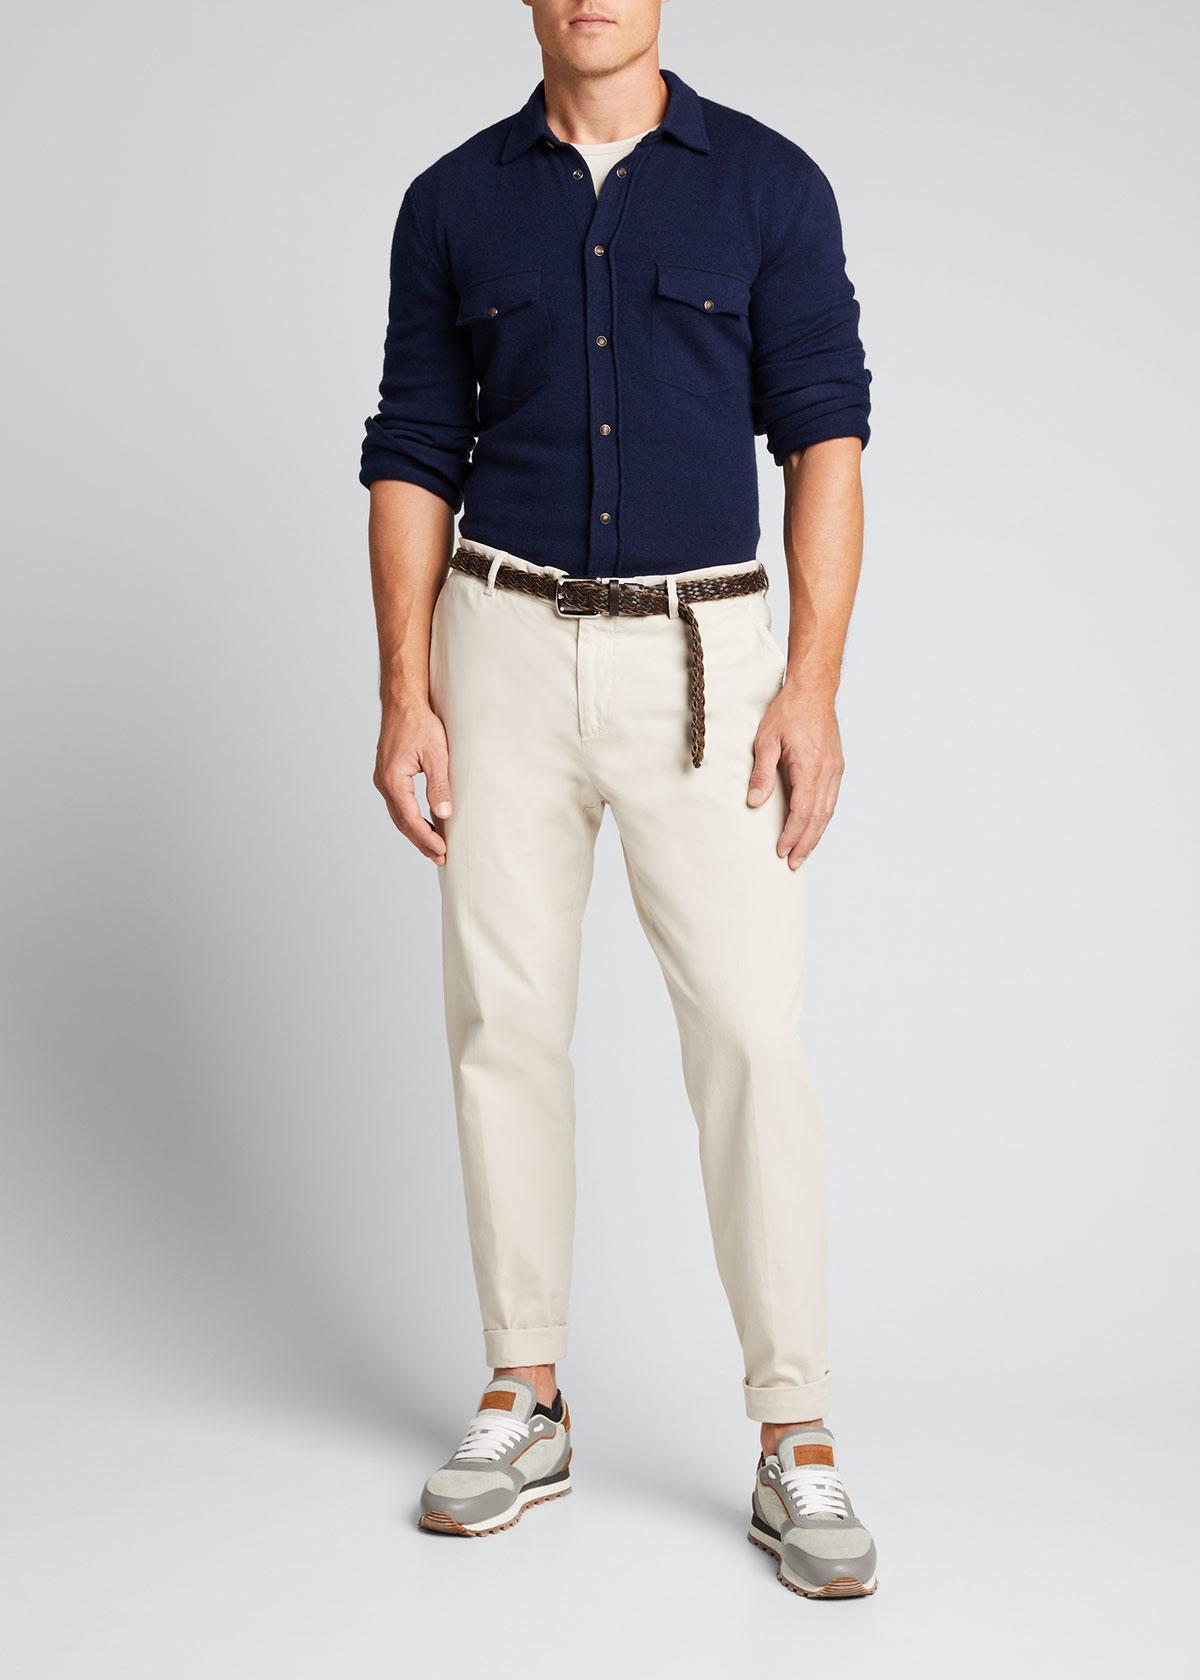 Brunello Cucinelli T-shirts MEN'S WESTERN-STYLE SHIRT CARDIGAN